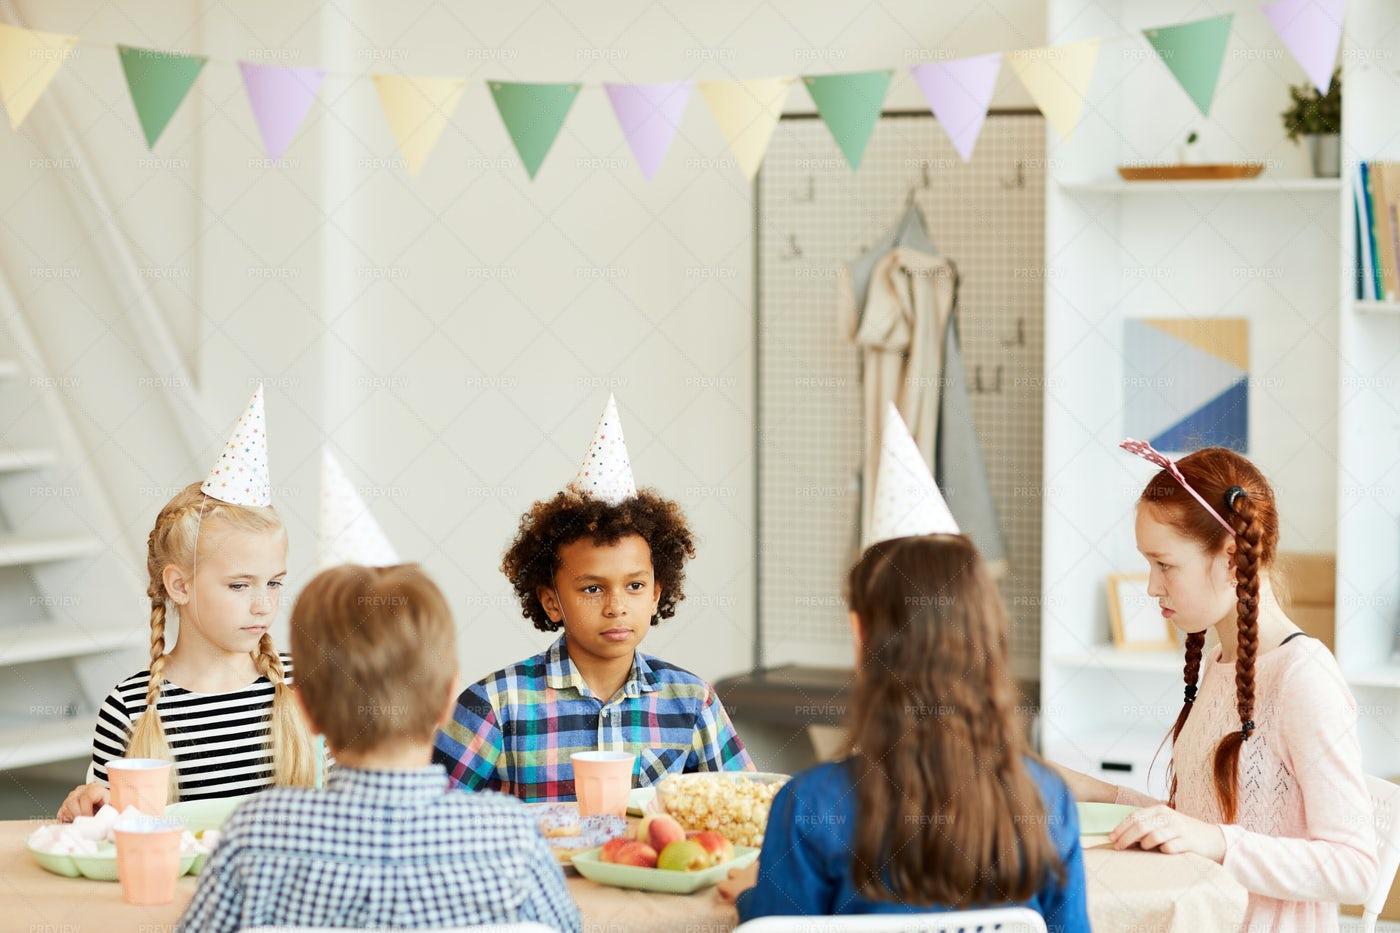 Birthday Party For Children: Stock Photos